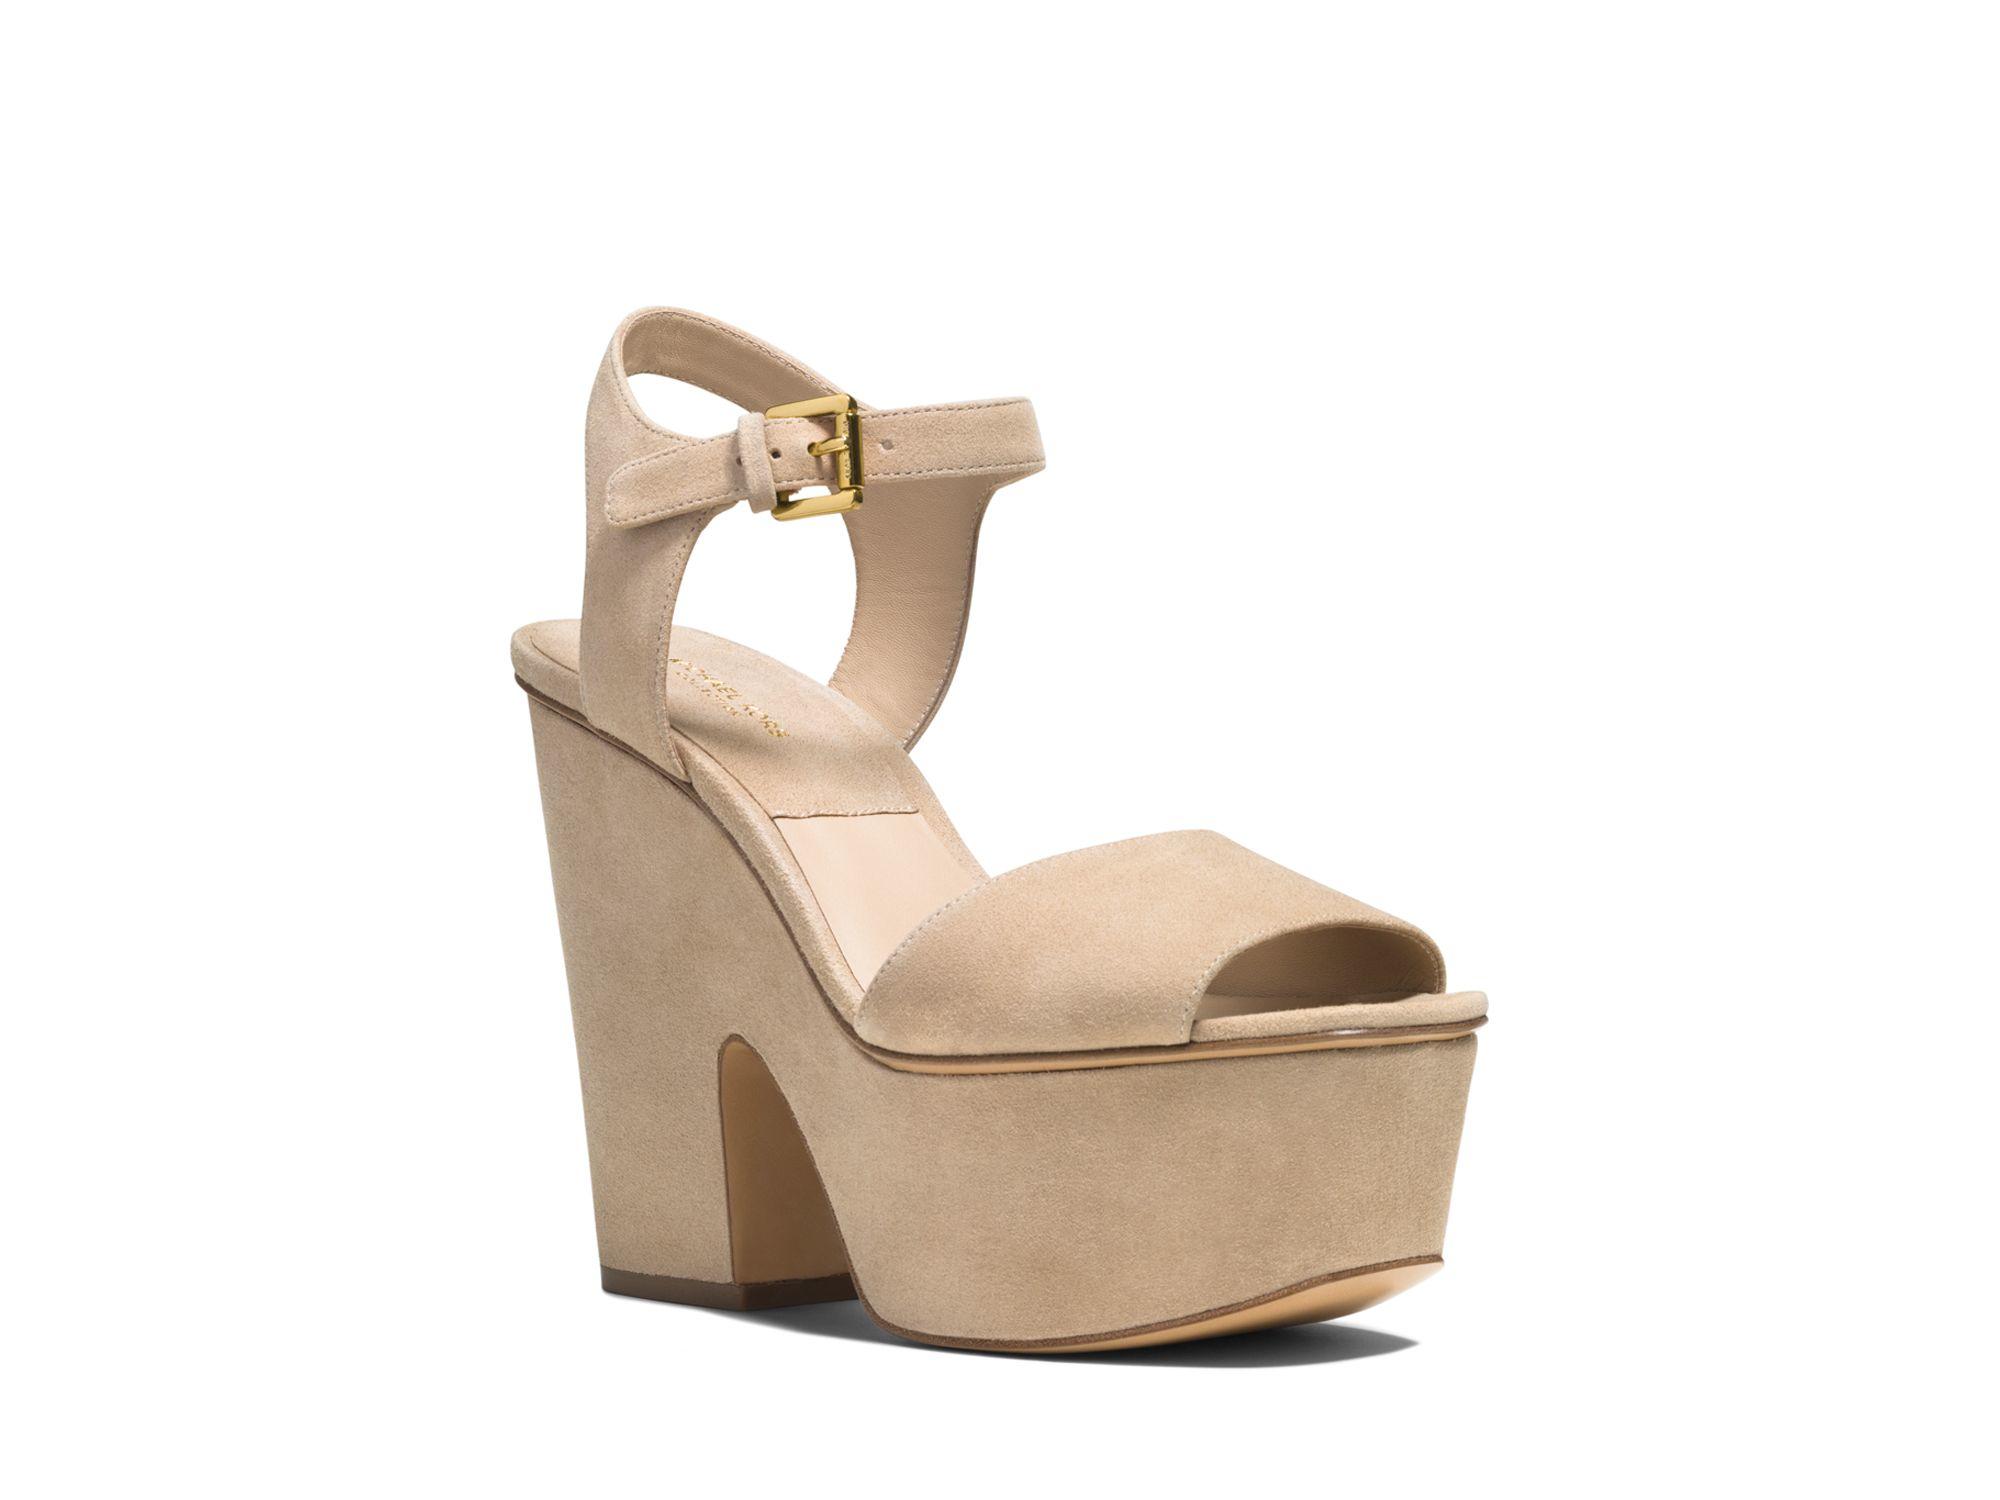 aa13d5ac6db Lyst - Michael Kors Platform Sandals - Harley Suede High Heel in Natural